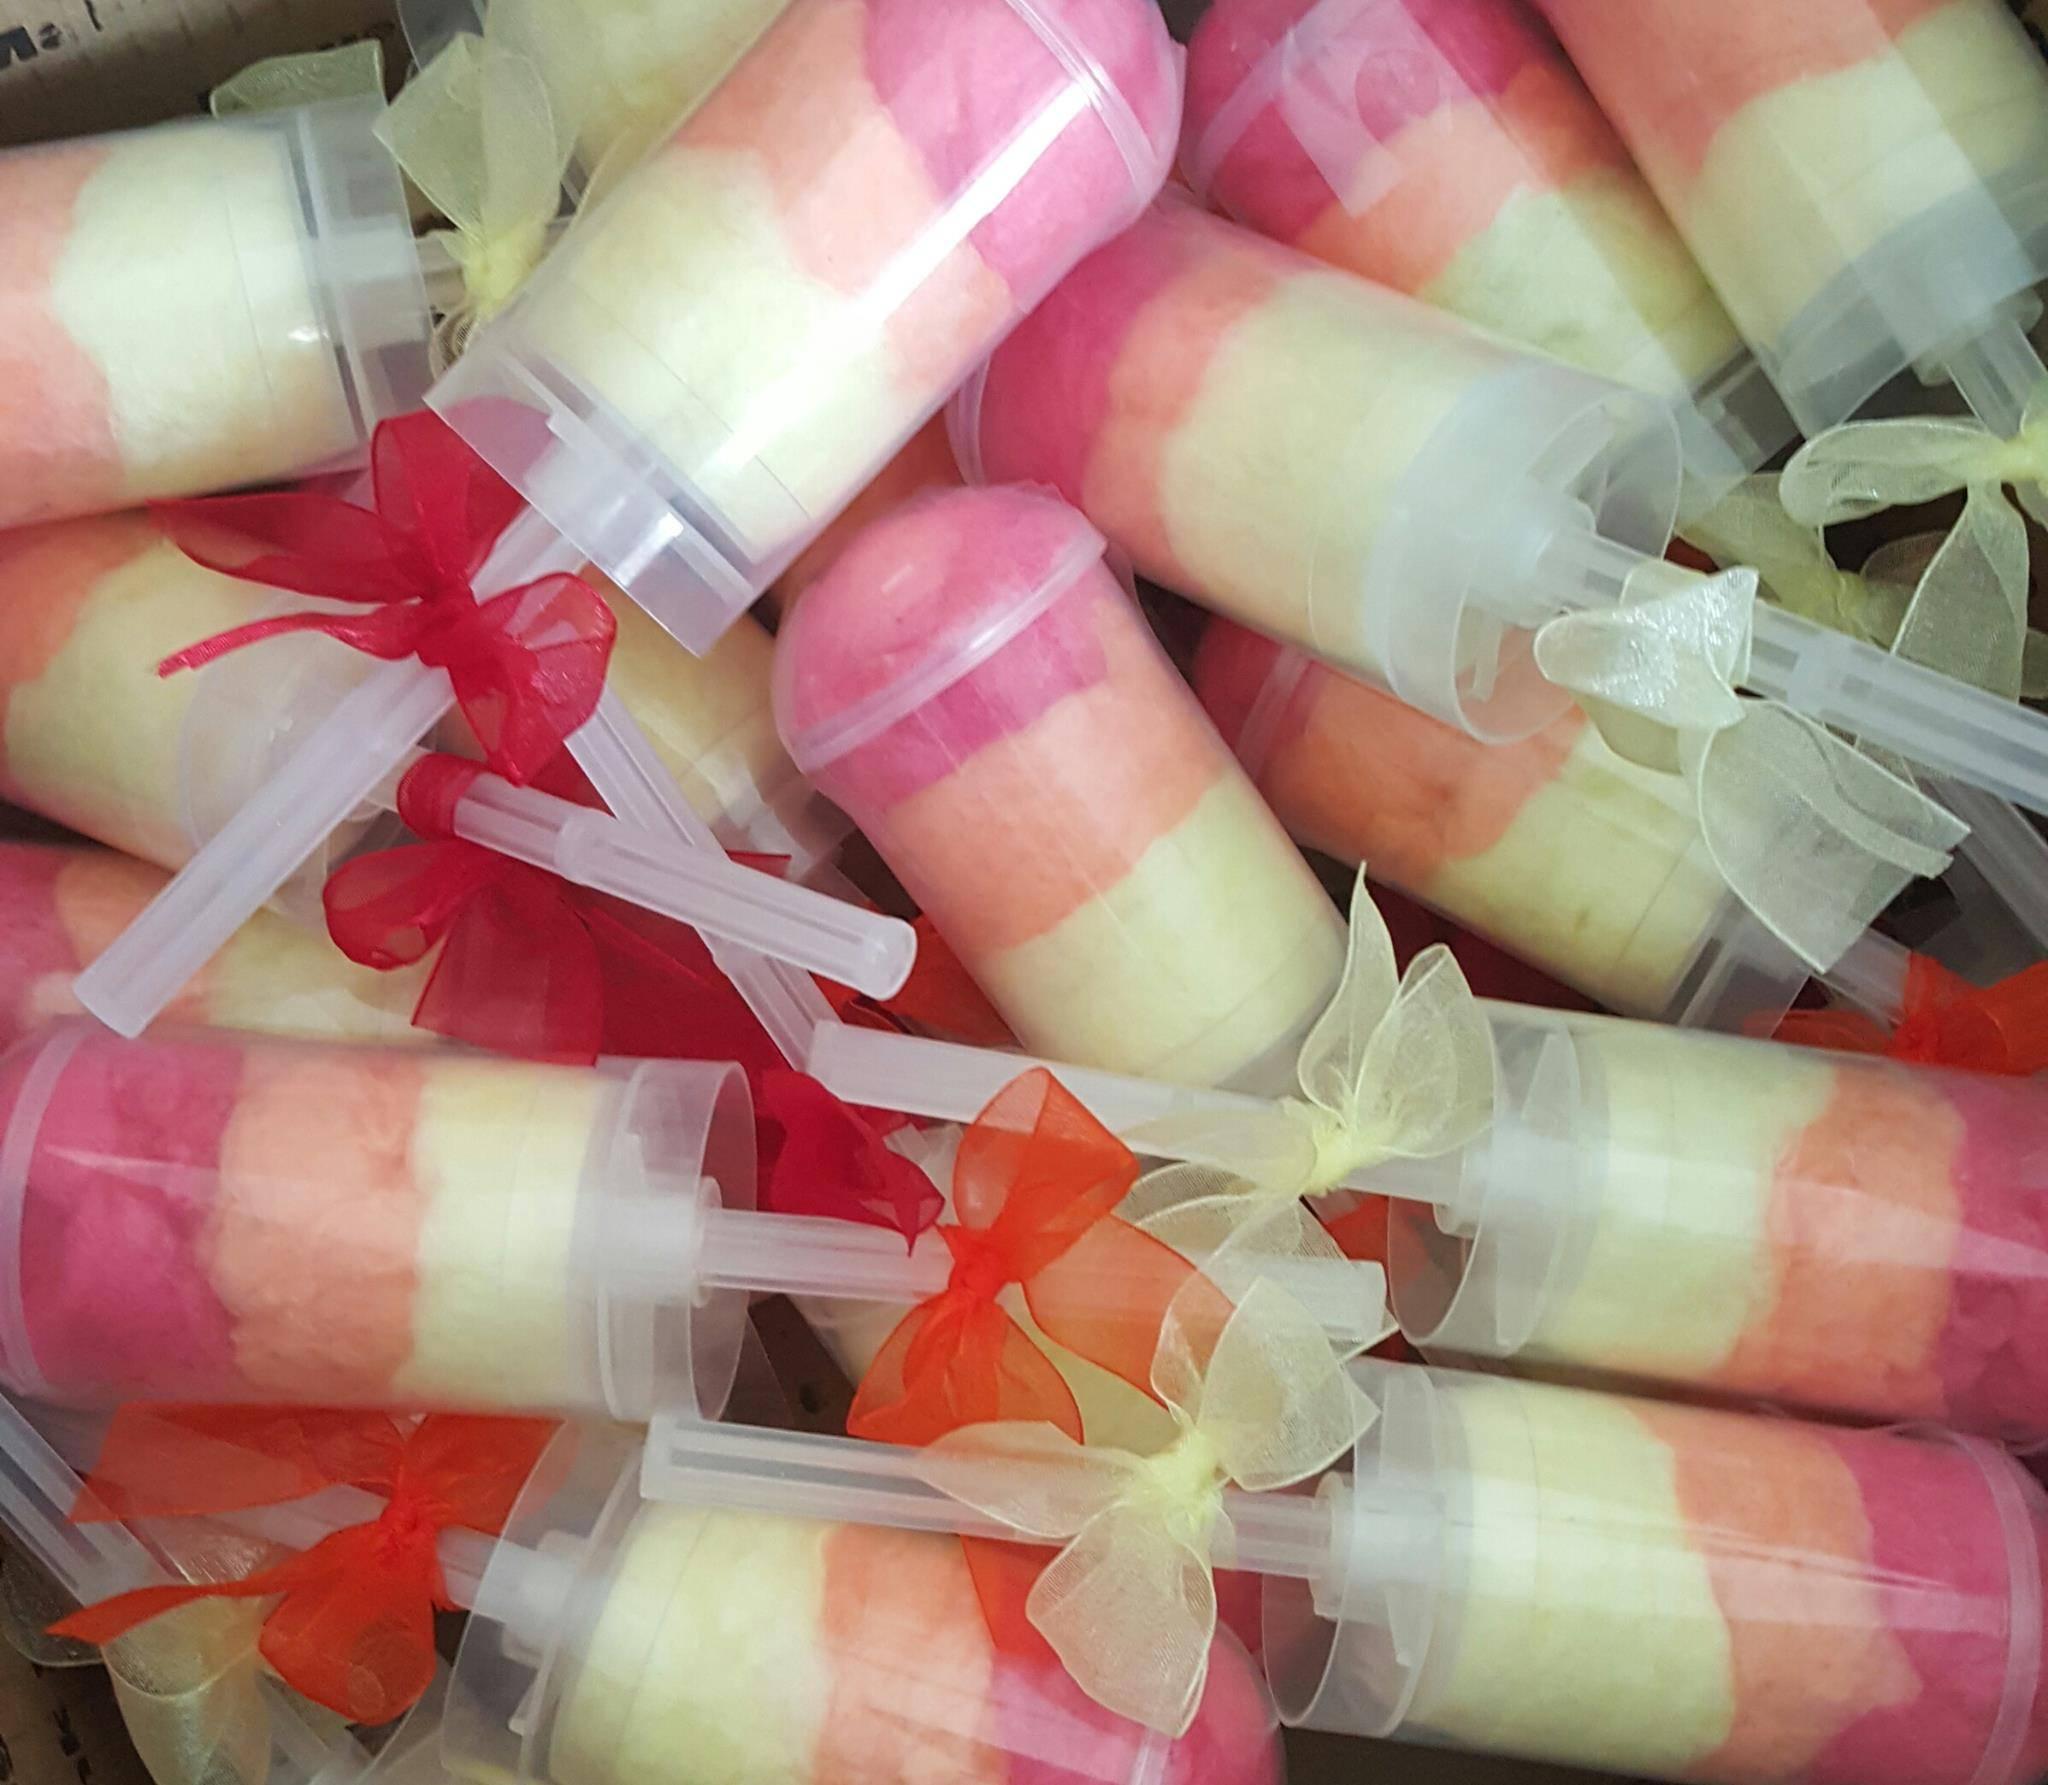 Cotton candy push pops